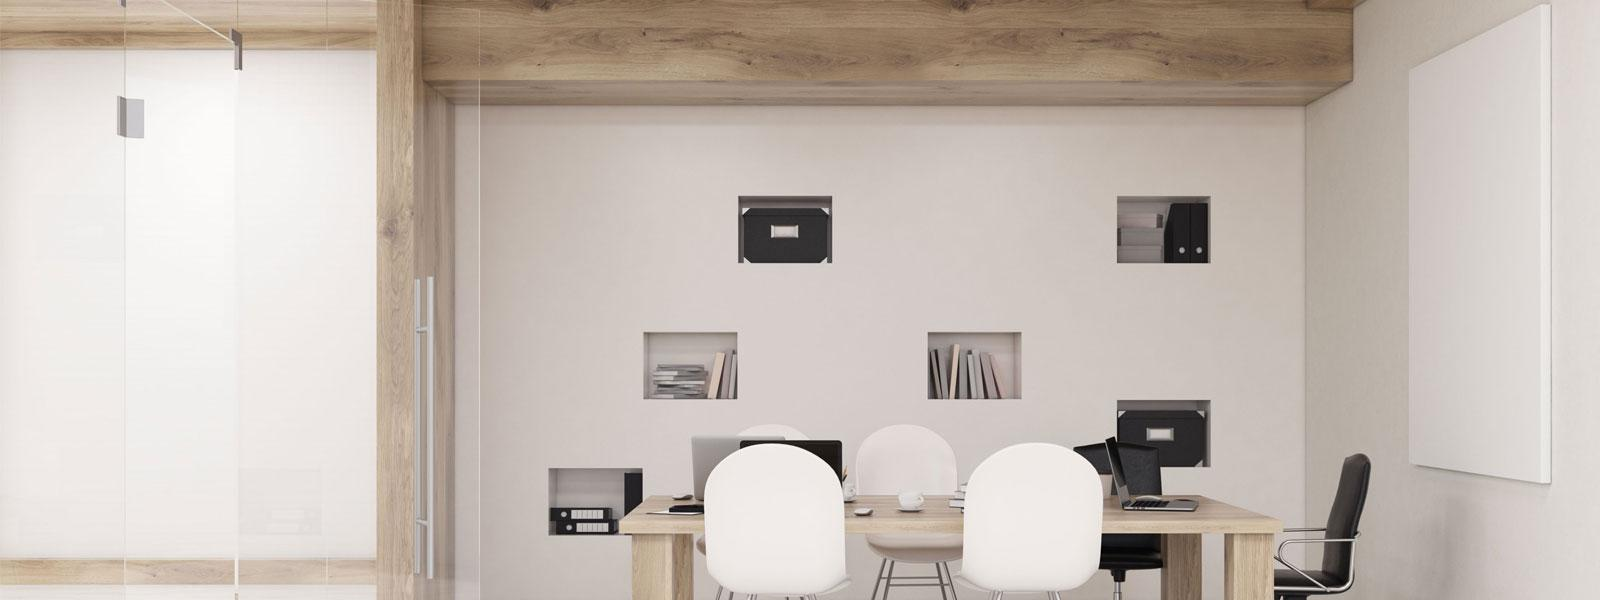 Tansun's Radiant Heating Panels